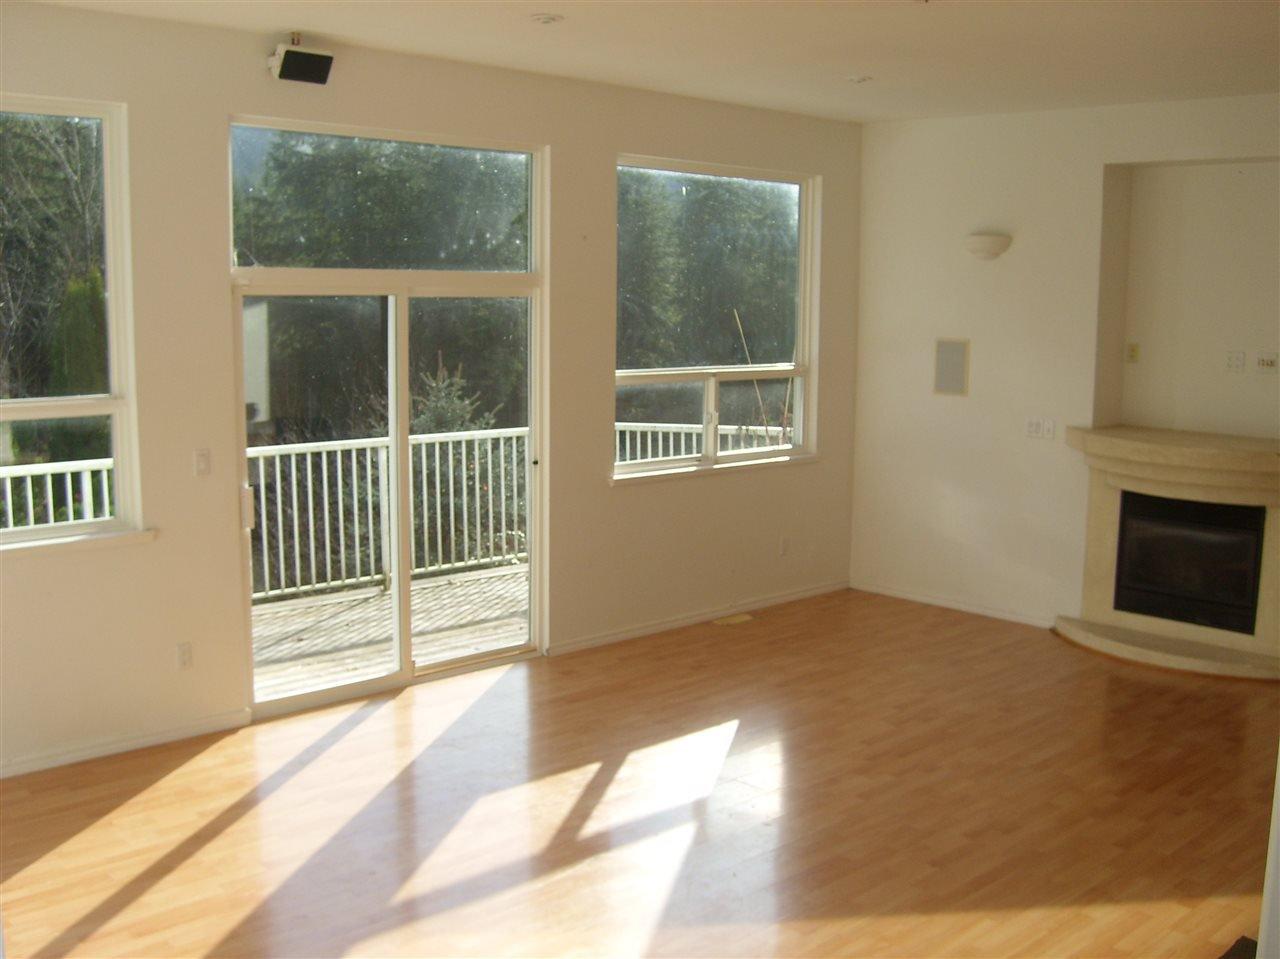 Photo 12: Photos: 28640 123 Avenue in Maple Ridge: Northeast House for sale : MLS®# R2419989